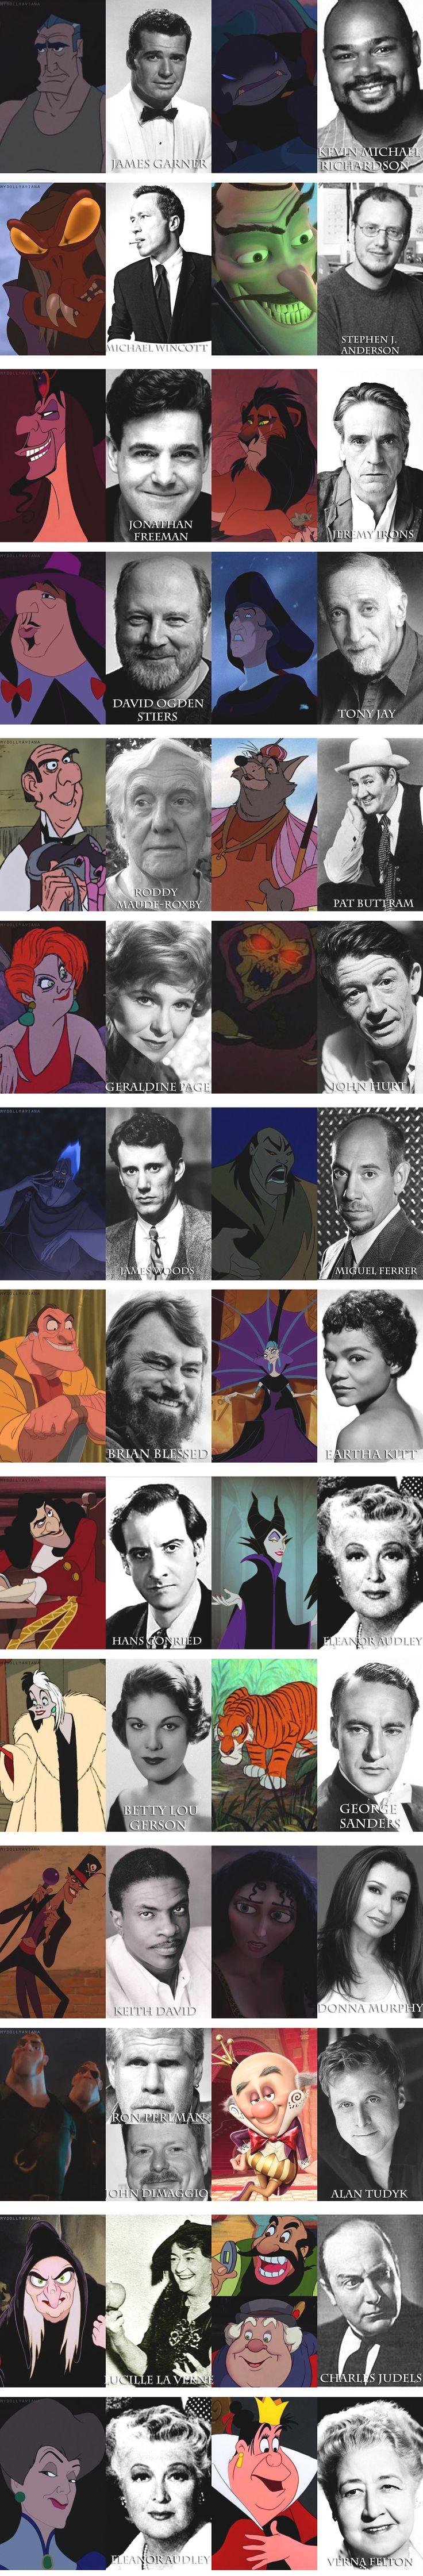 Disney Villains and their voice actors